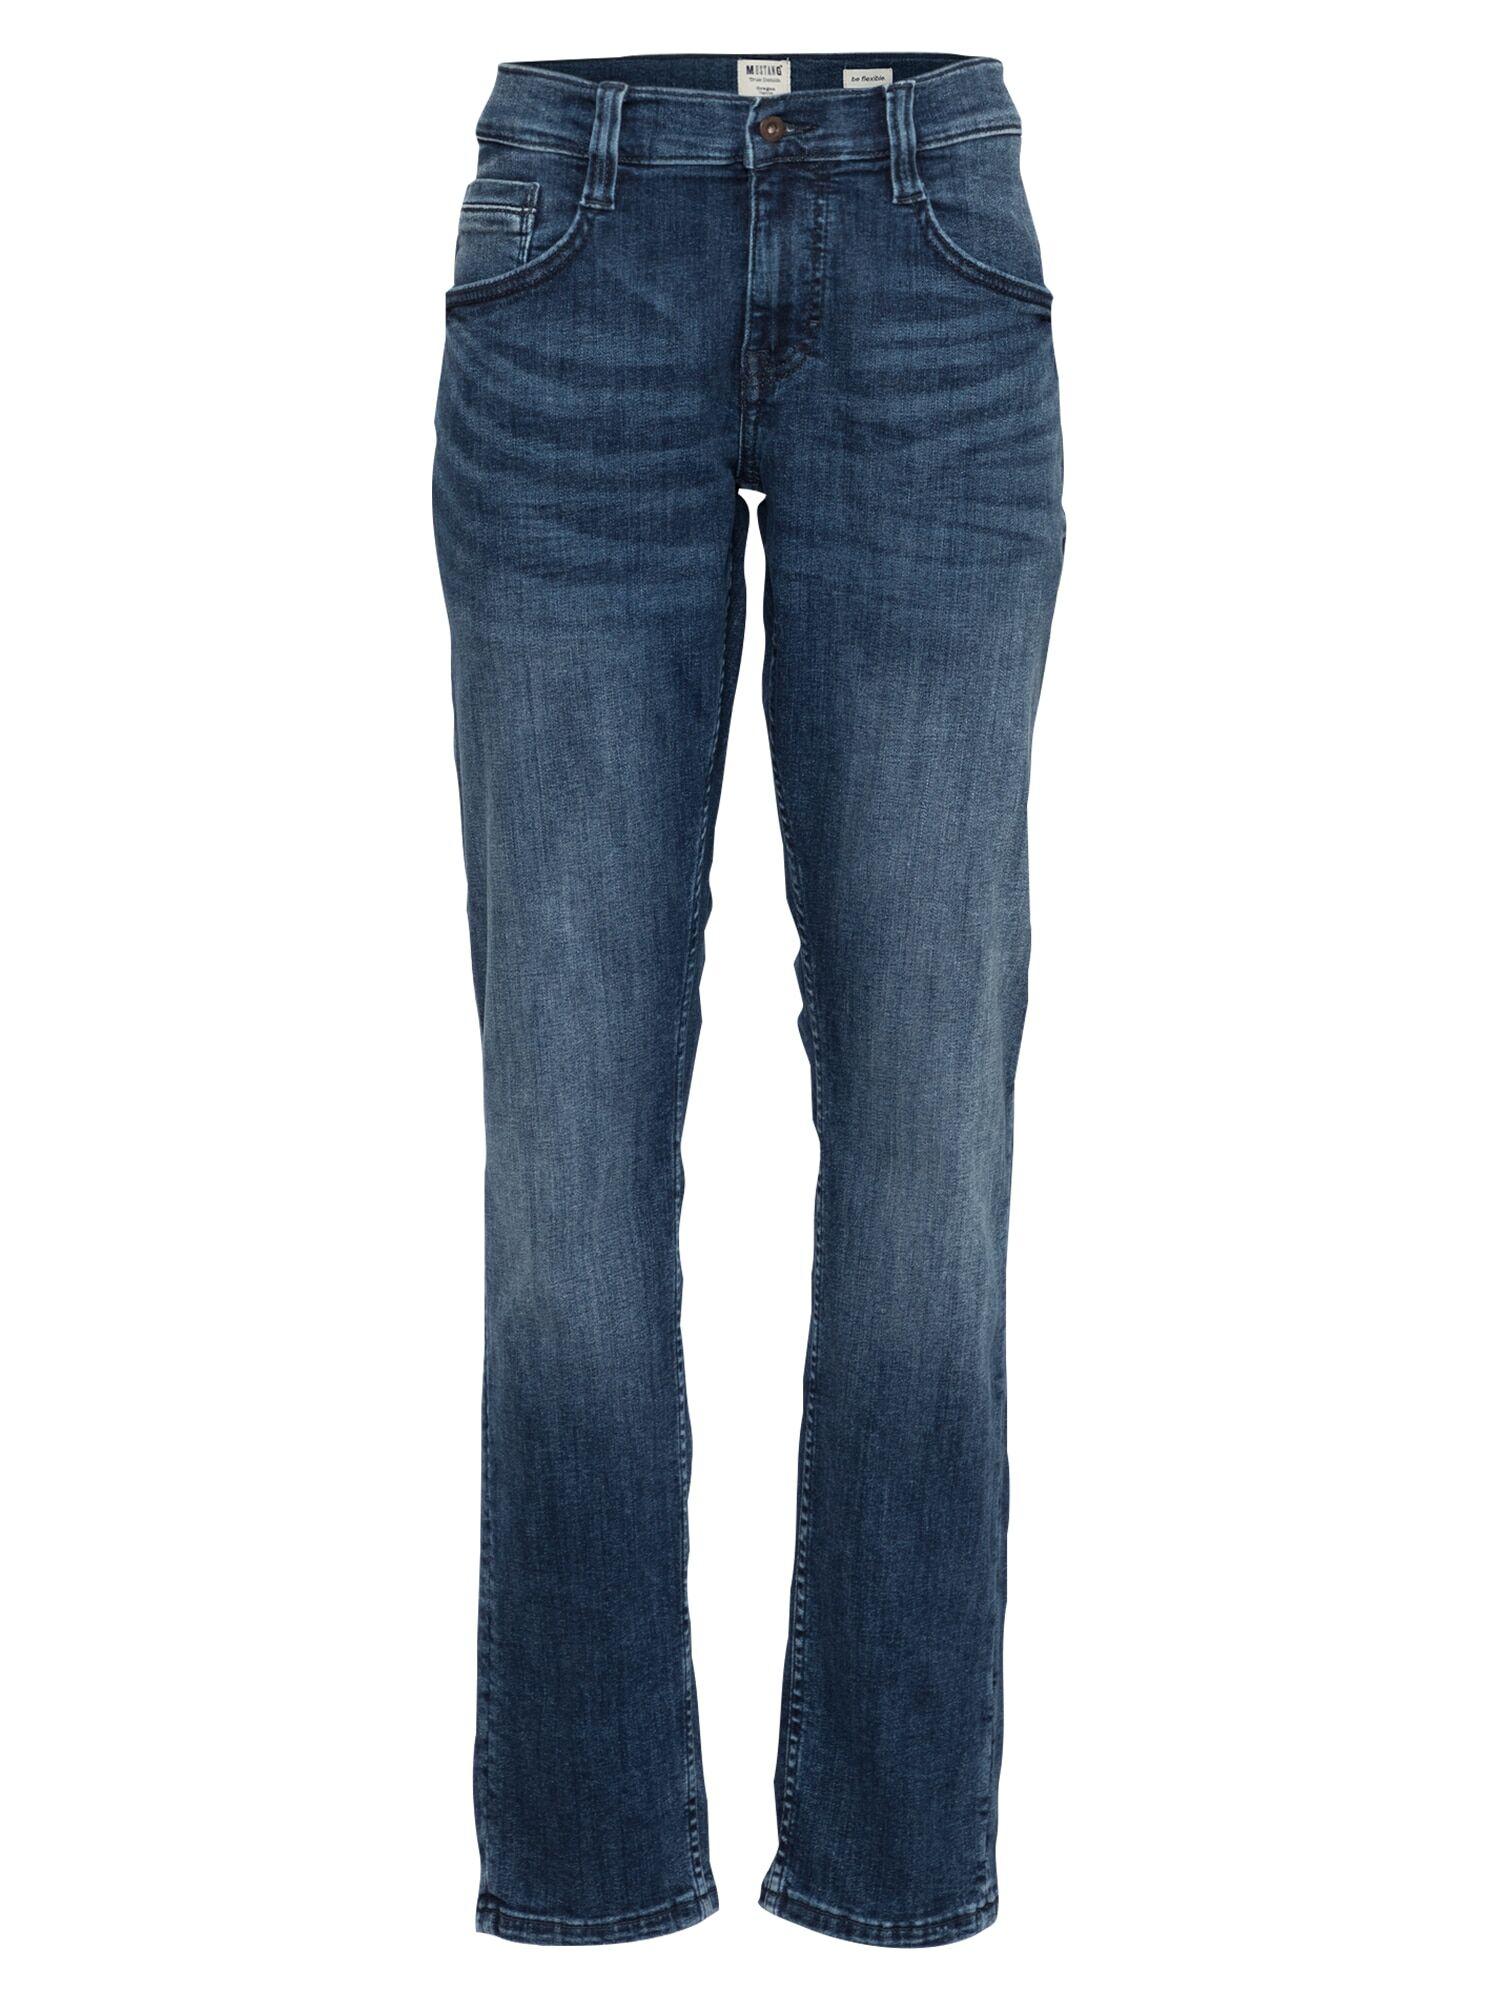 MUSTANG Jean 'Oregon'  - Bleu - Taille: 36/30 - male